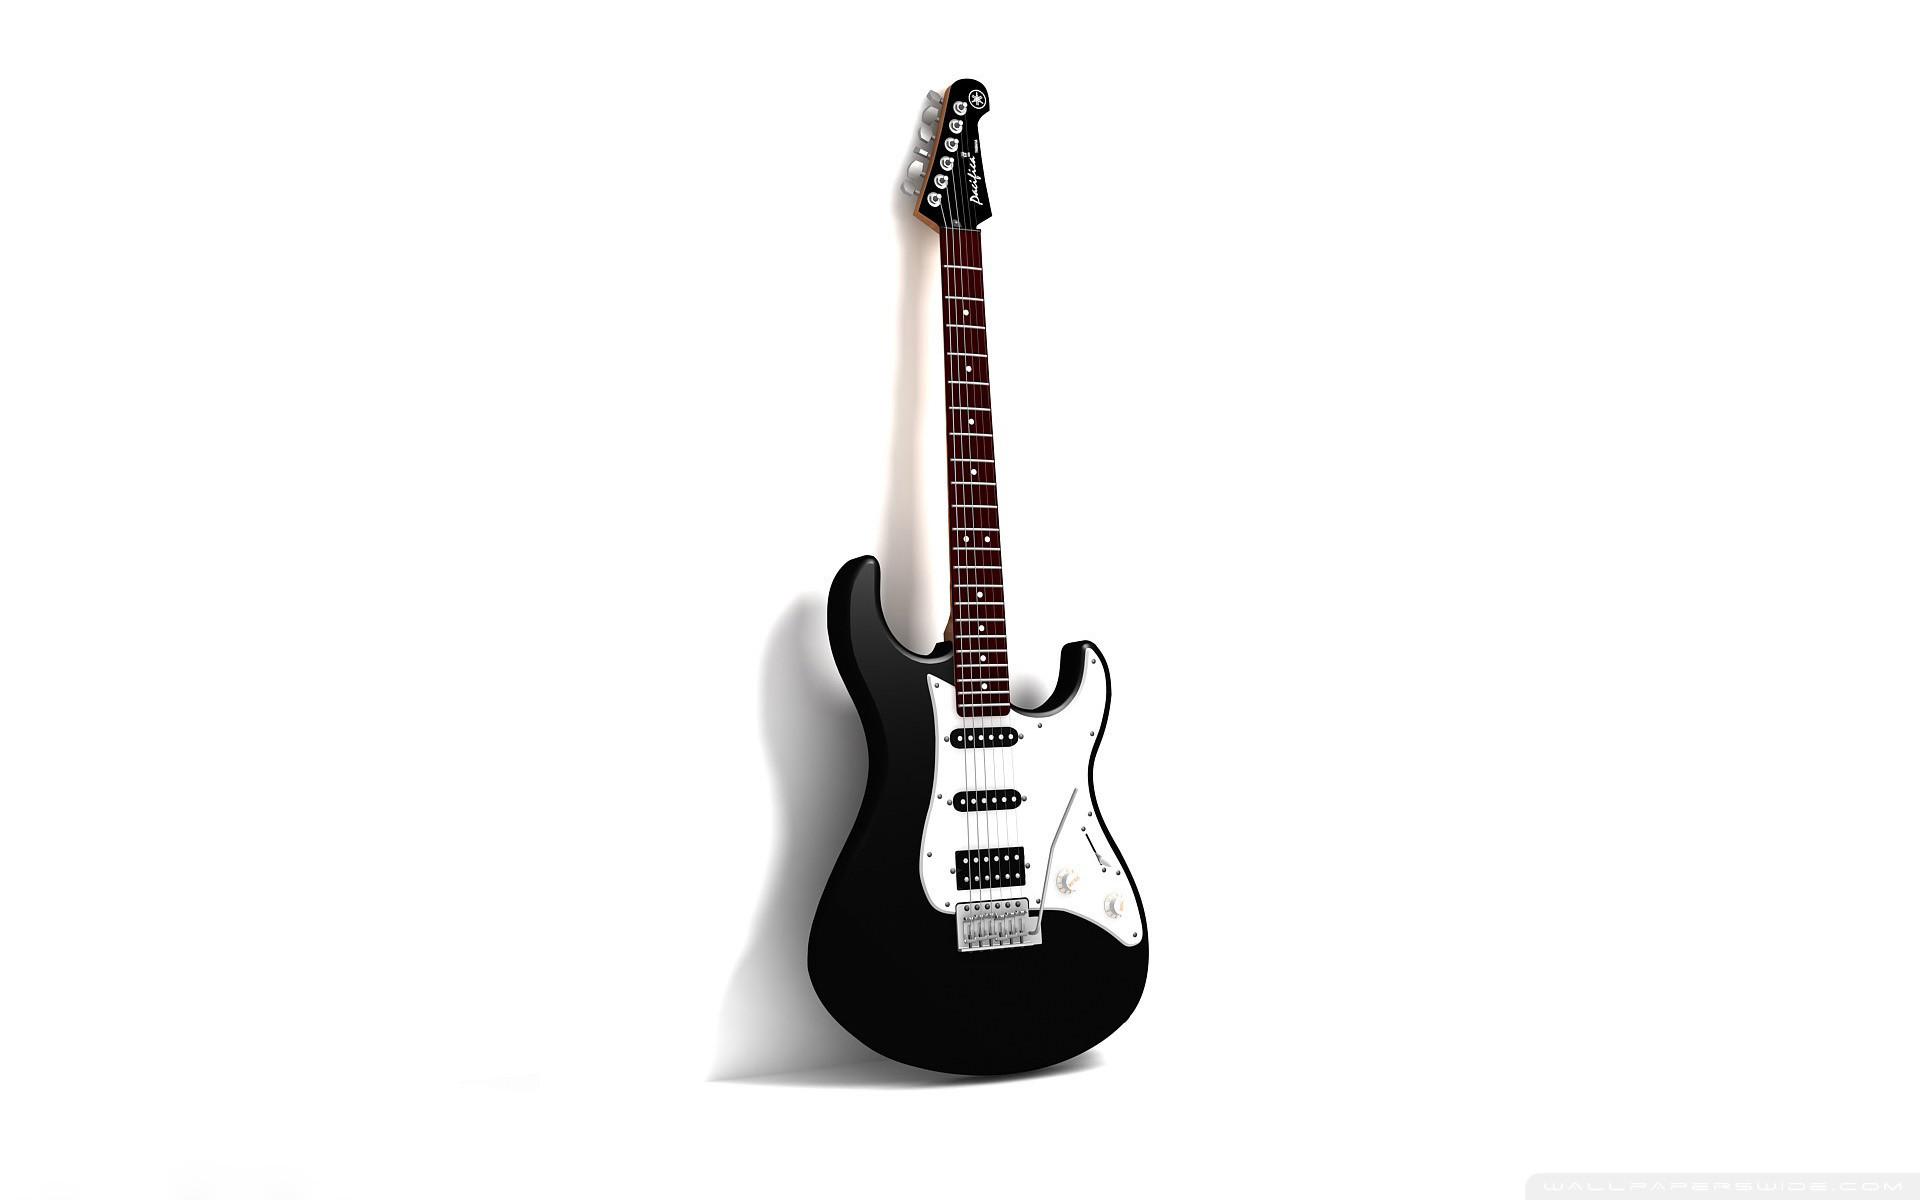 guitar wallpaper hd â